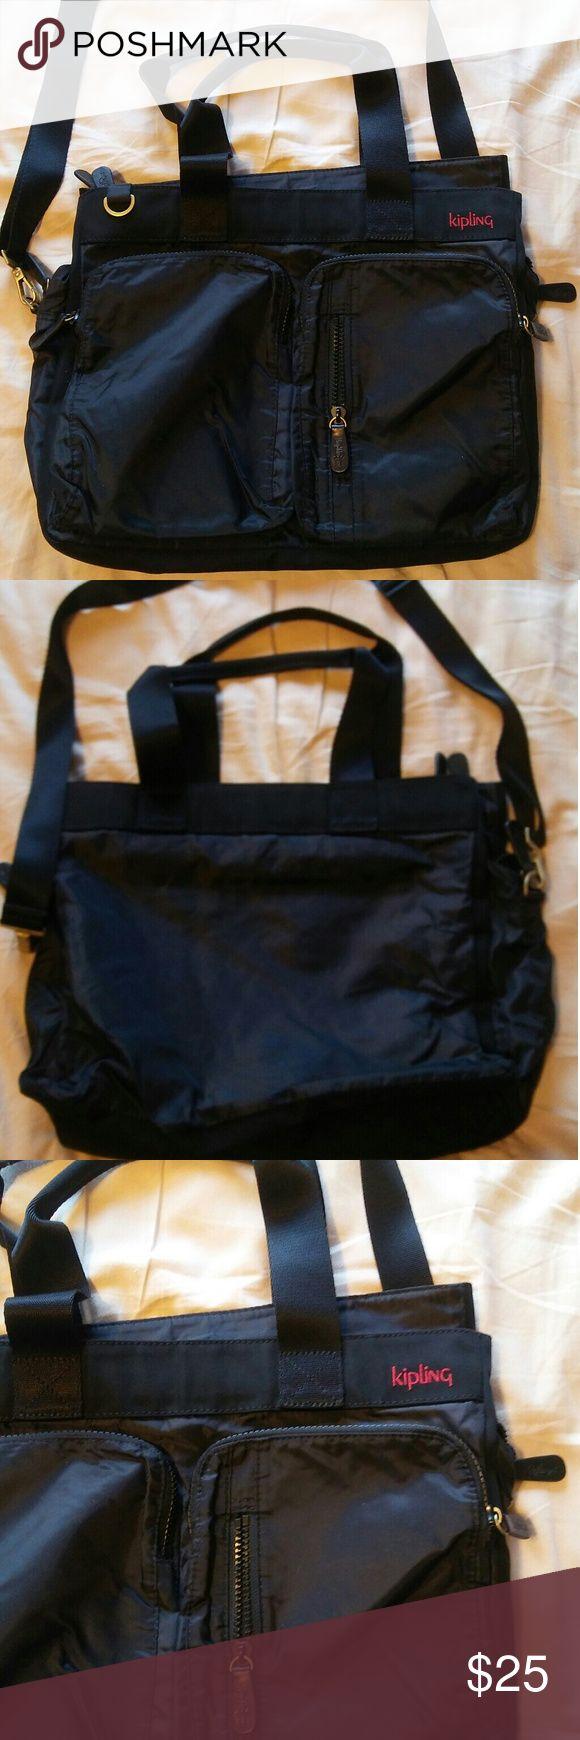 25 best ideas about kipling backpack on pinterest school handbags - Excellent Kipling Handbag Purse